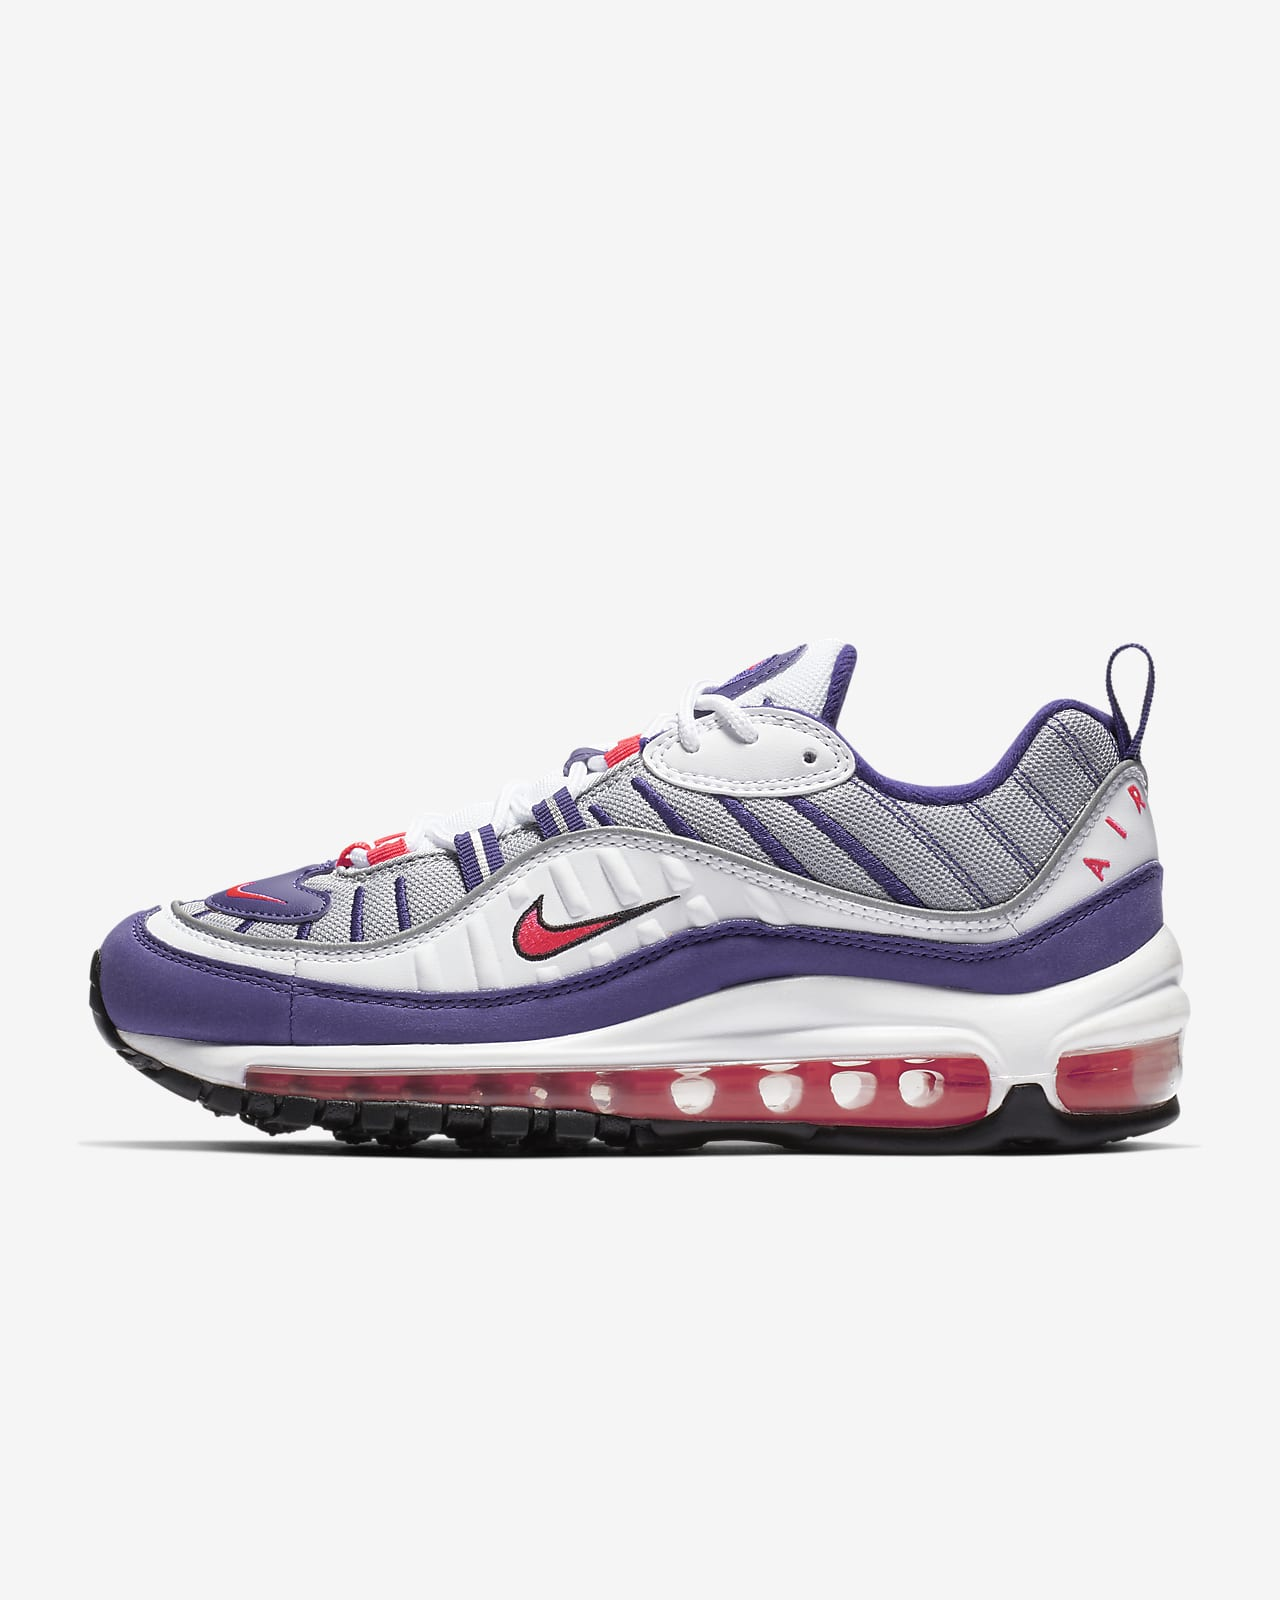 nike chaussure 98